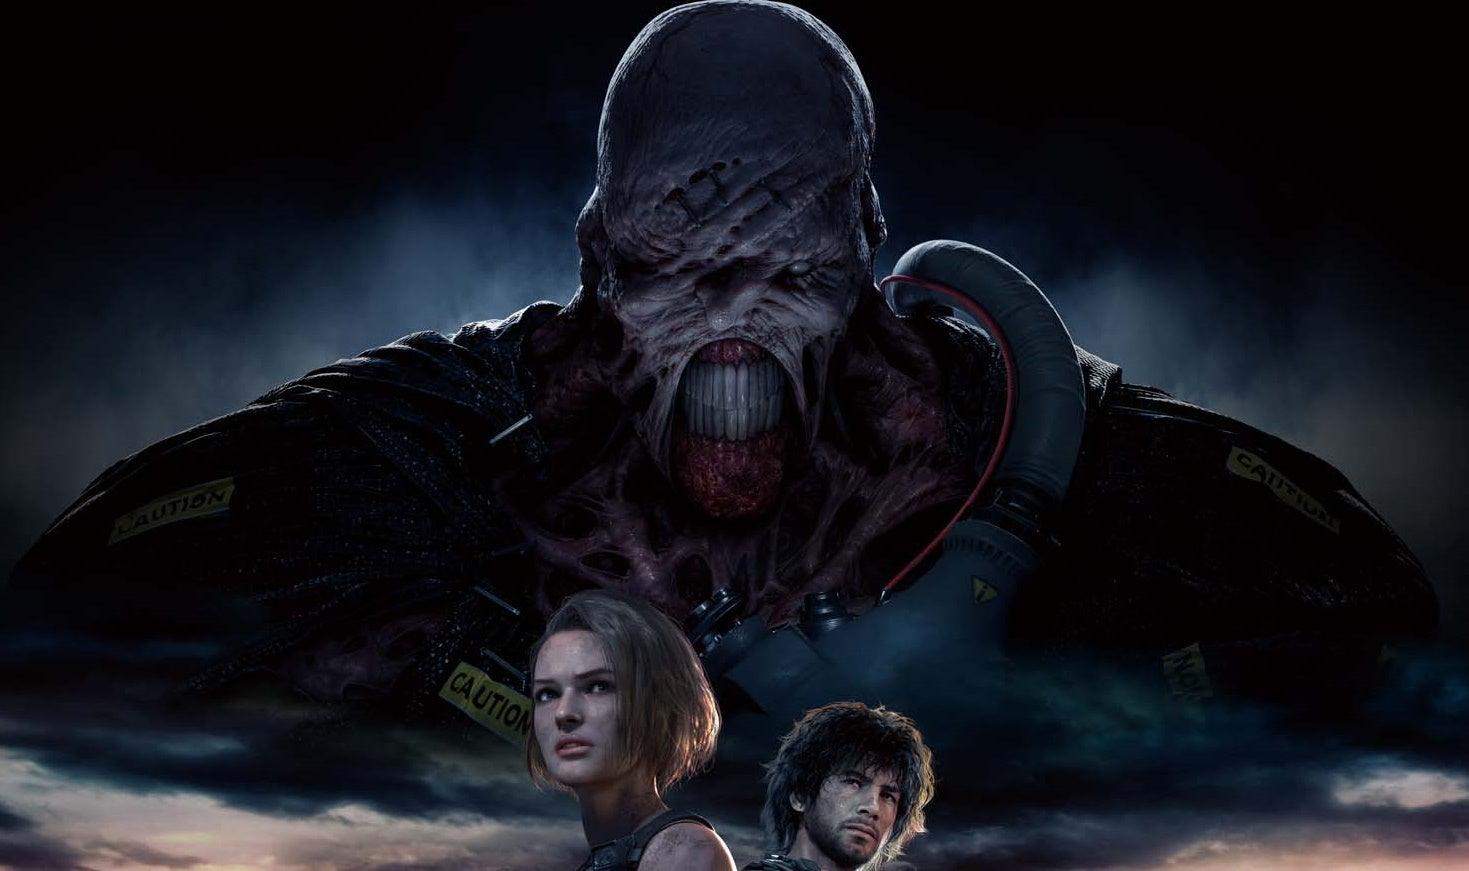 Image for Resident Evil 3 Remake guide, tips and walkthrough